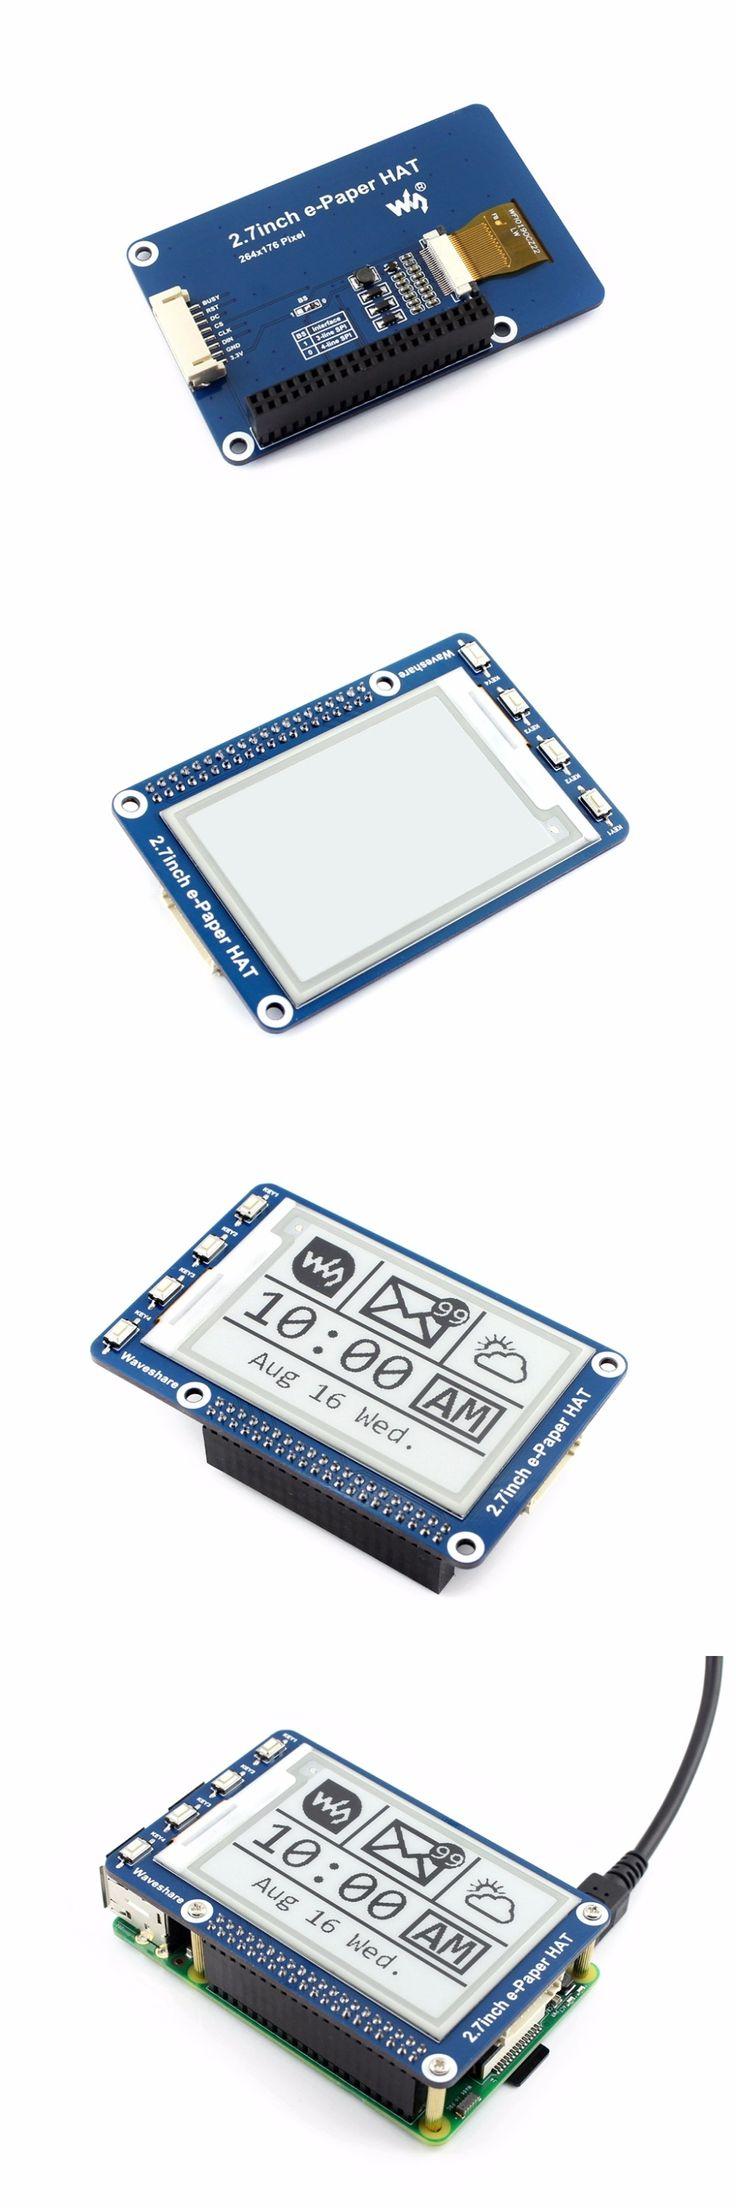 2.7''e-paper,264x176,2.7inch E-Ink display HAT for Raspberry Pi 2B/3B/Zero/Zero W,Color:Black,White,SPI Interface,No Backlight